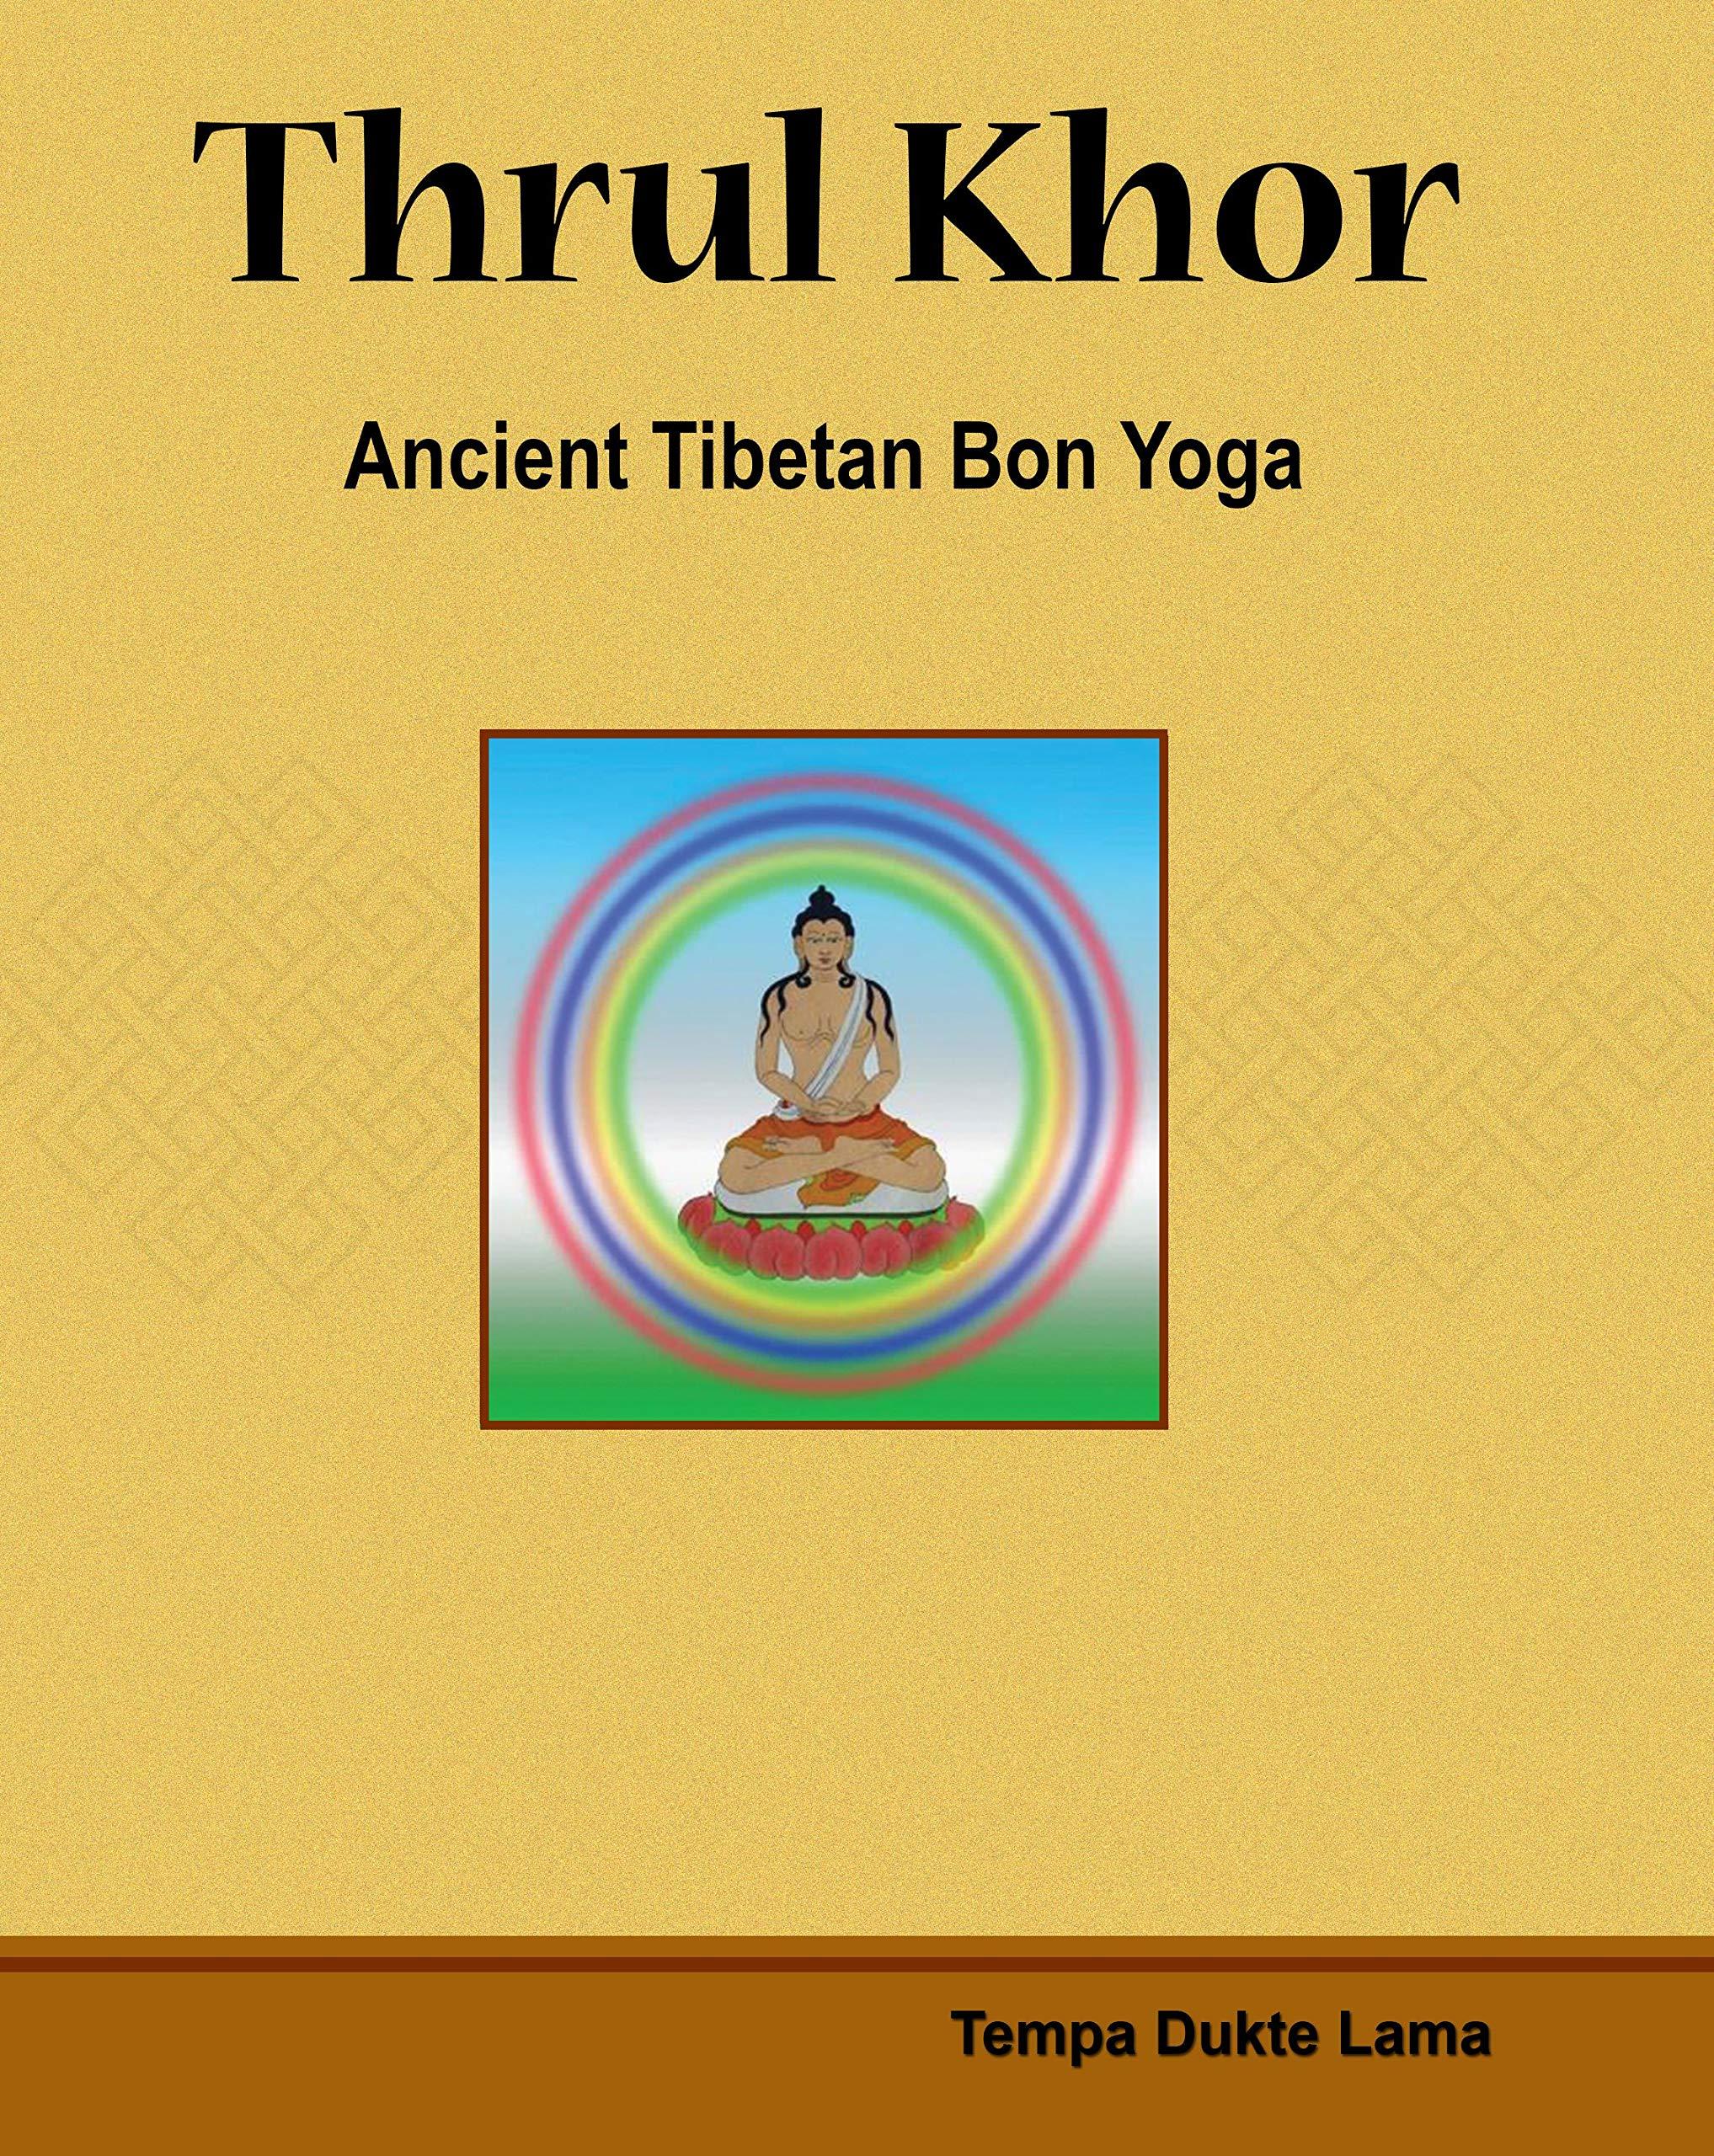 Amazon.com: Thrul Khor: Ancient Tibetan Bon Yoga ...